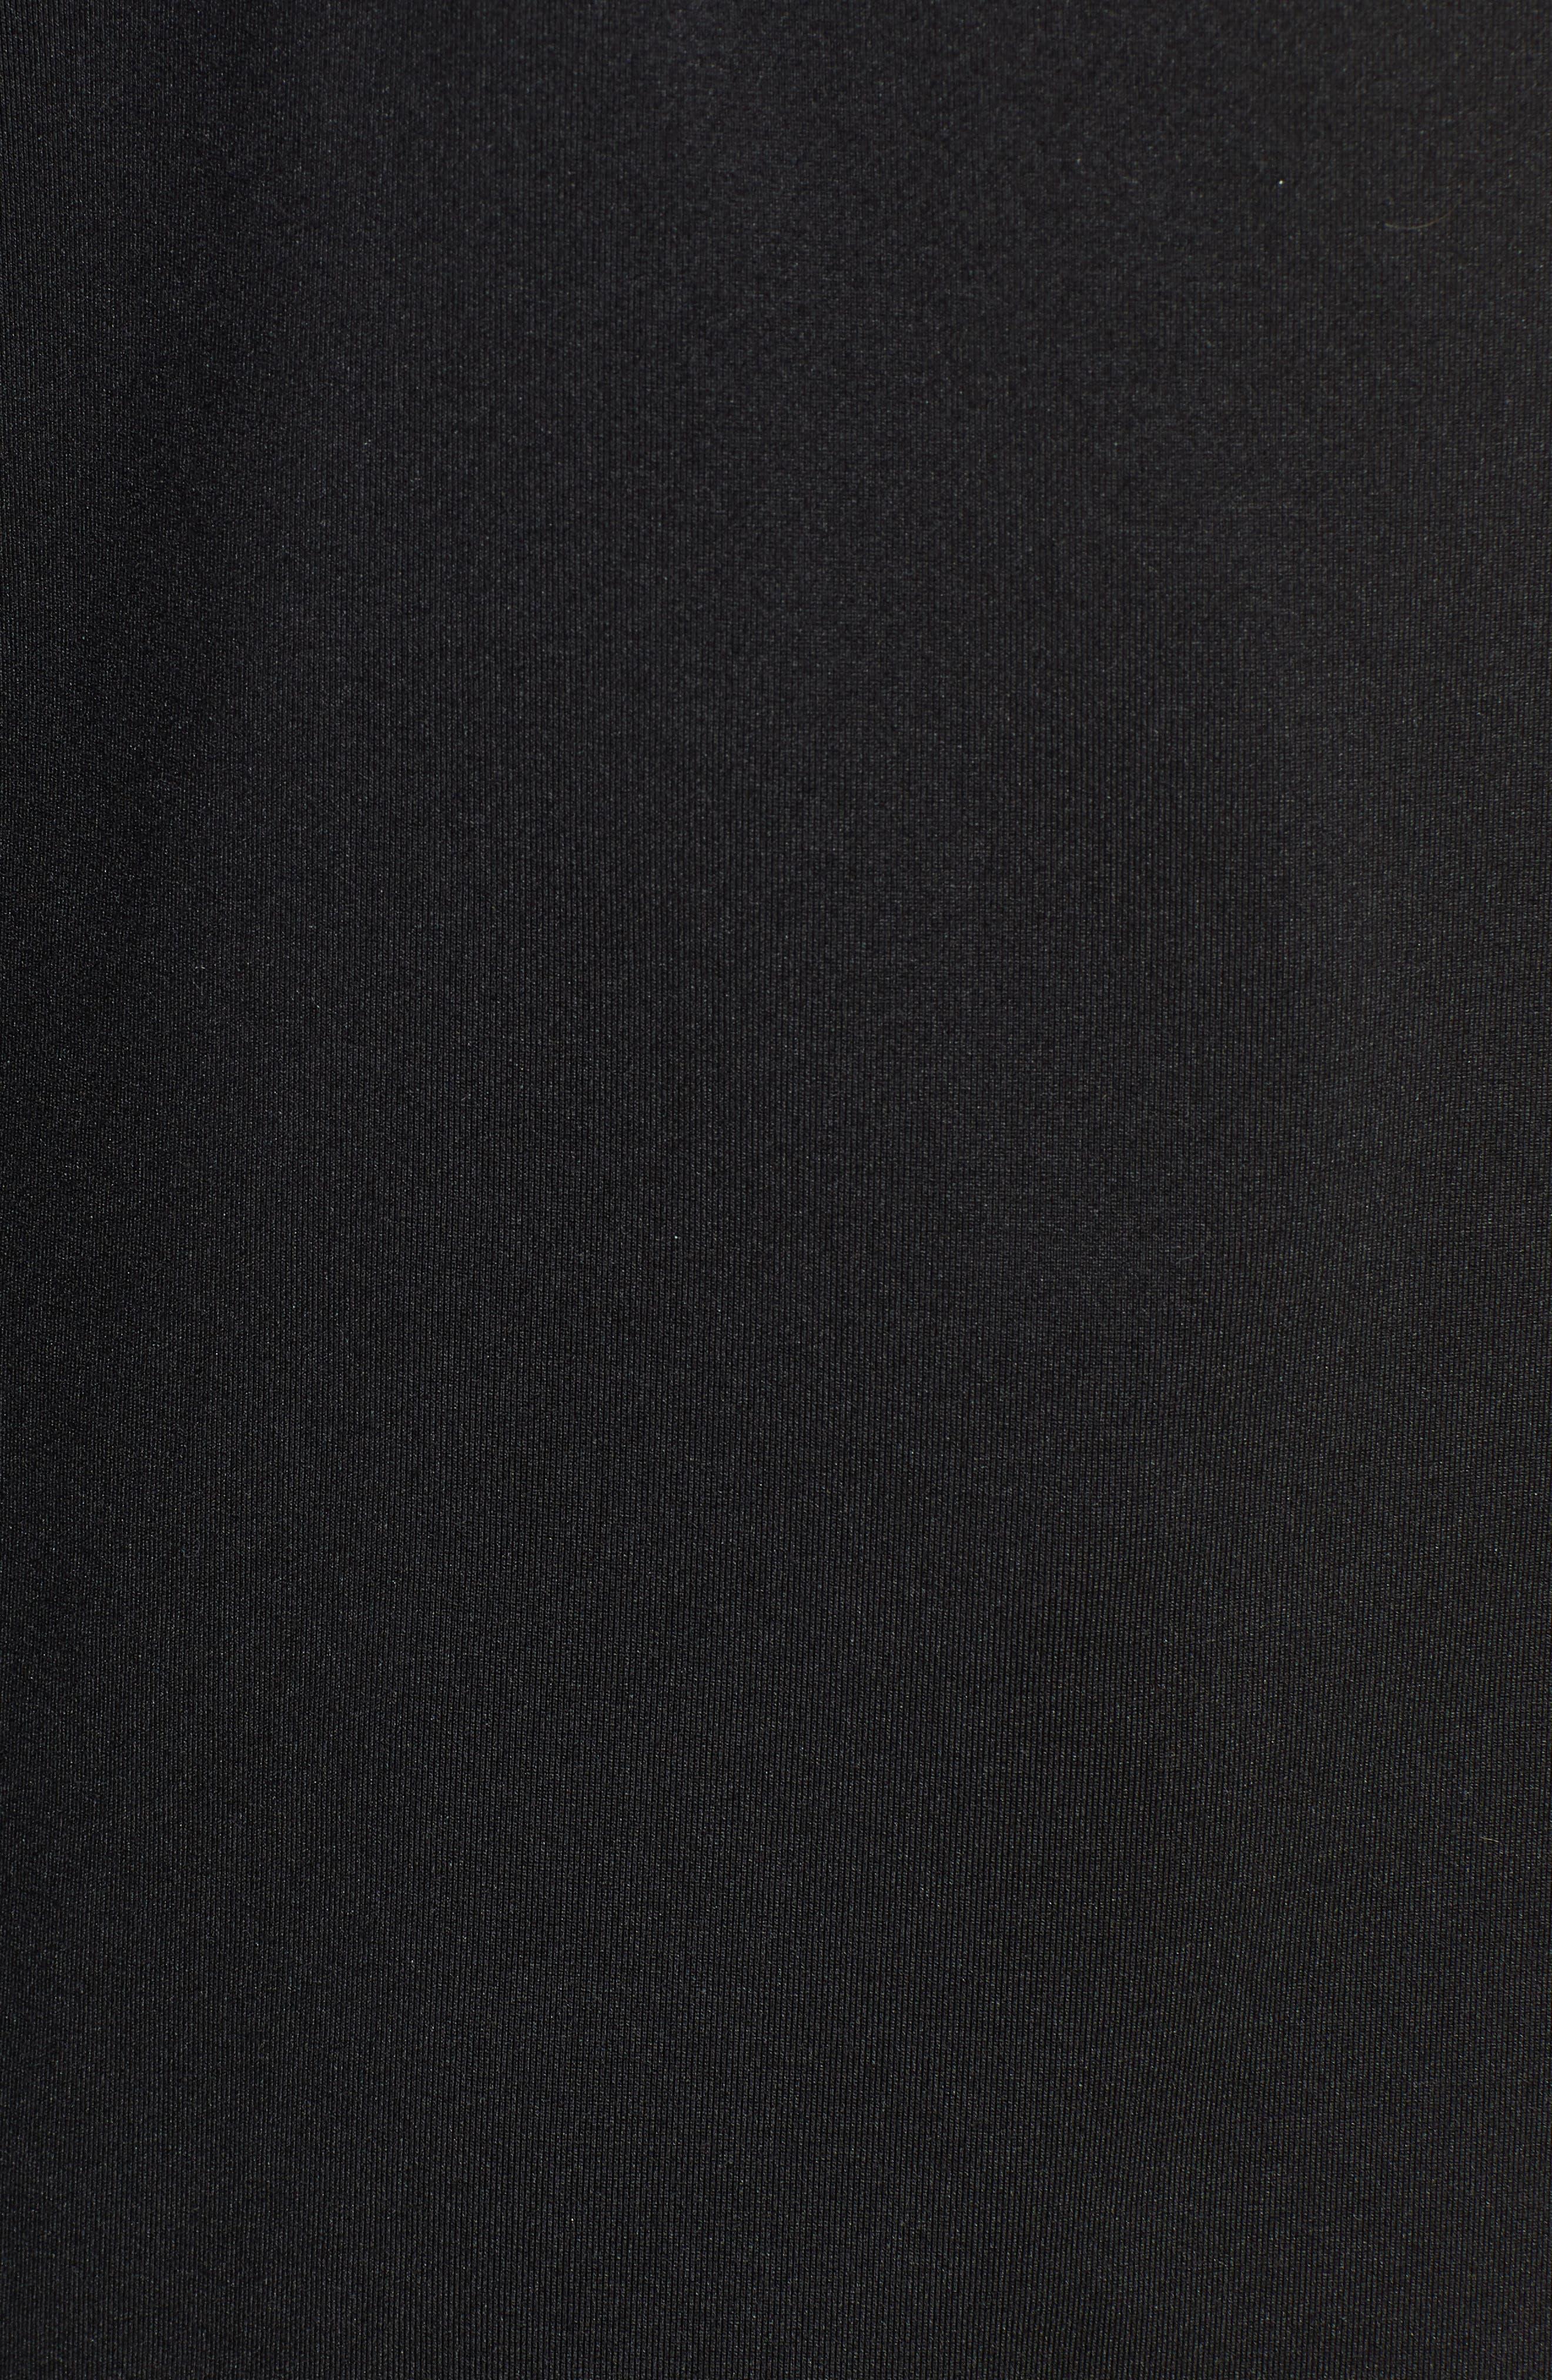 NIKE, Element Long-Sleeve Running Top, Alternate thumbnail 6, color, BLACK